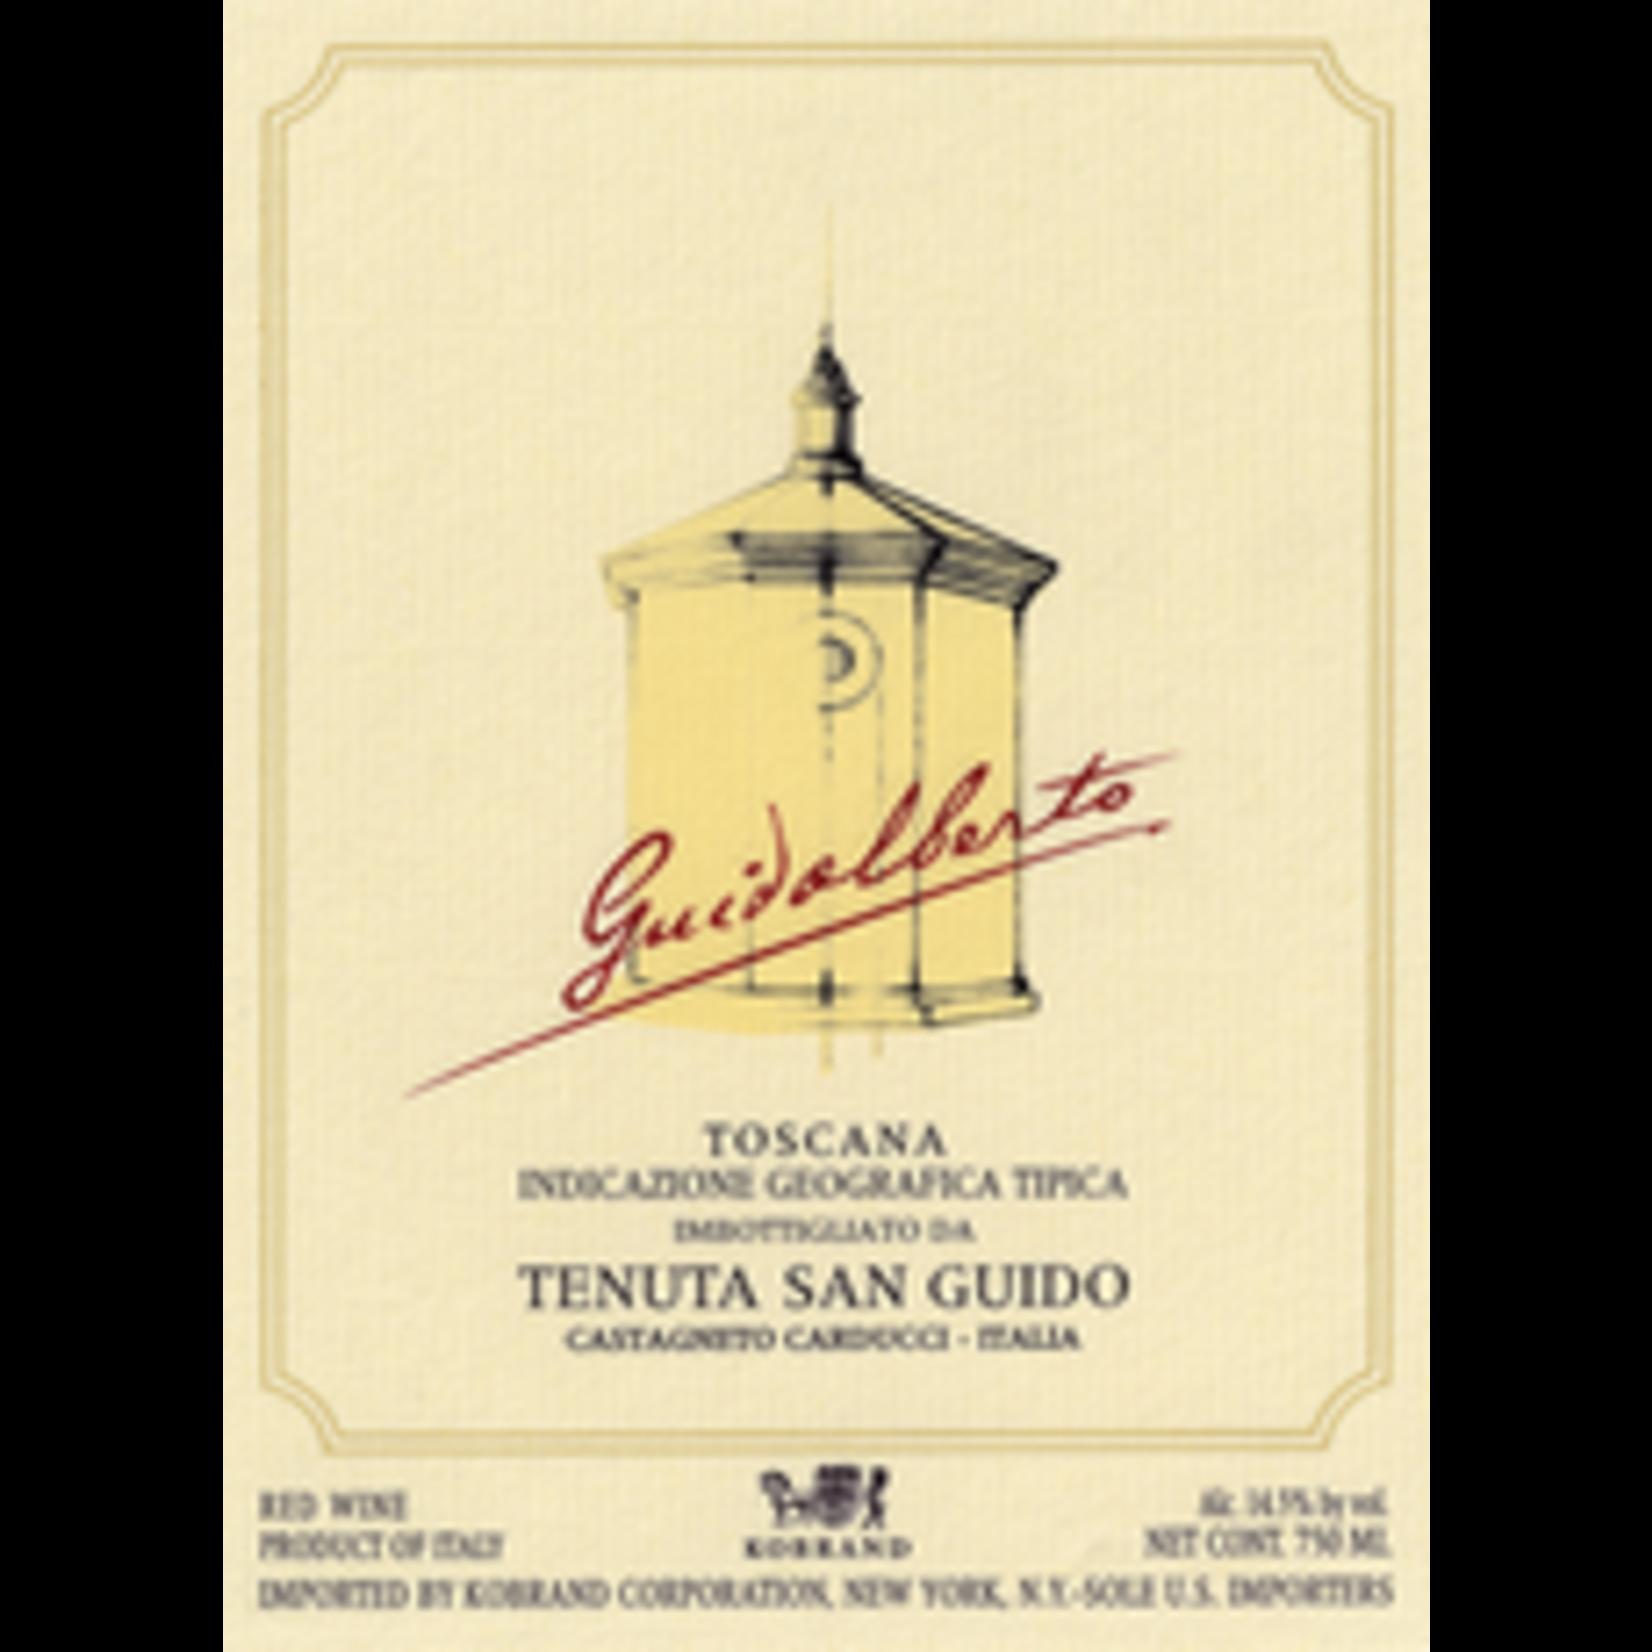 Wine Tenuta San Guido Guidalberto 2019